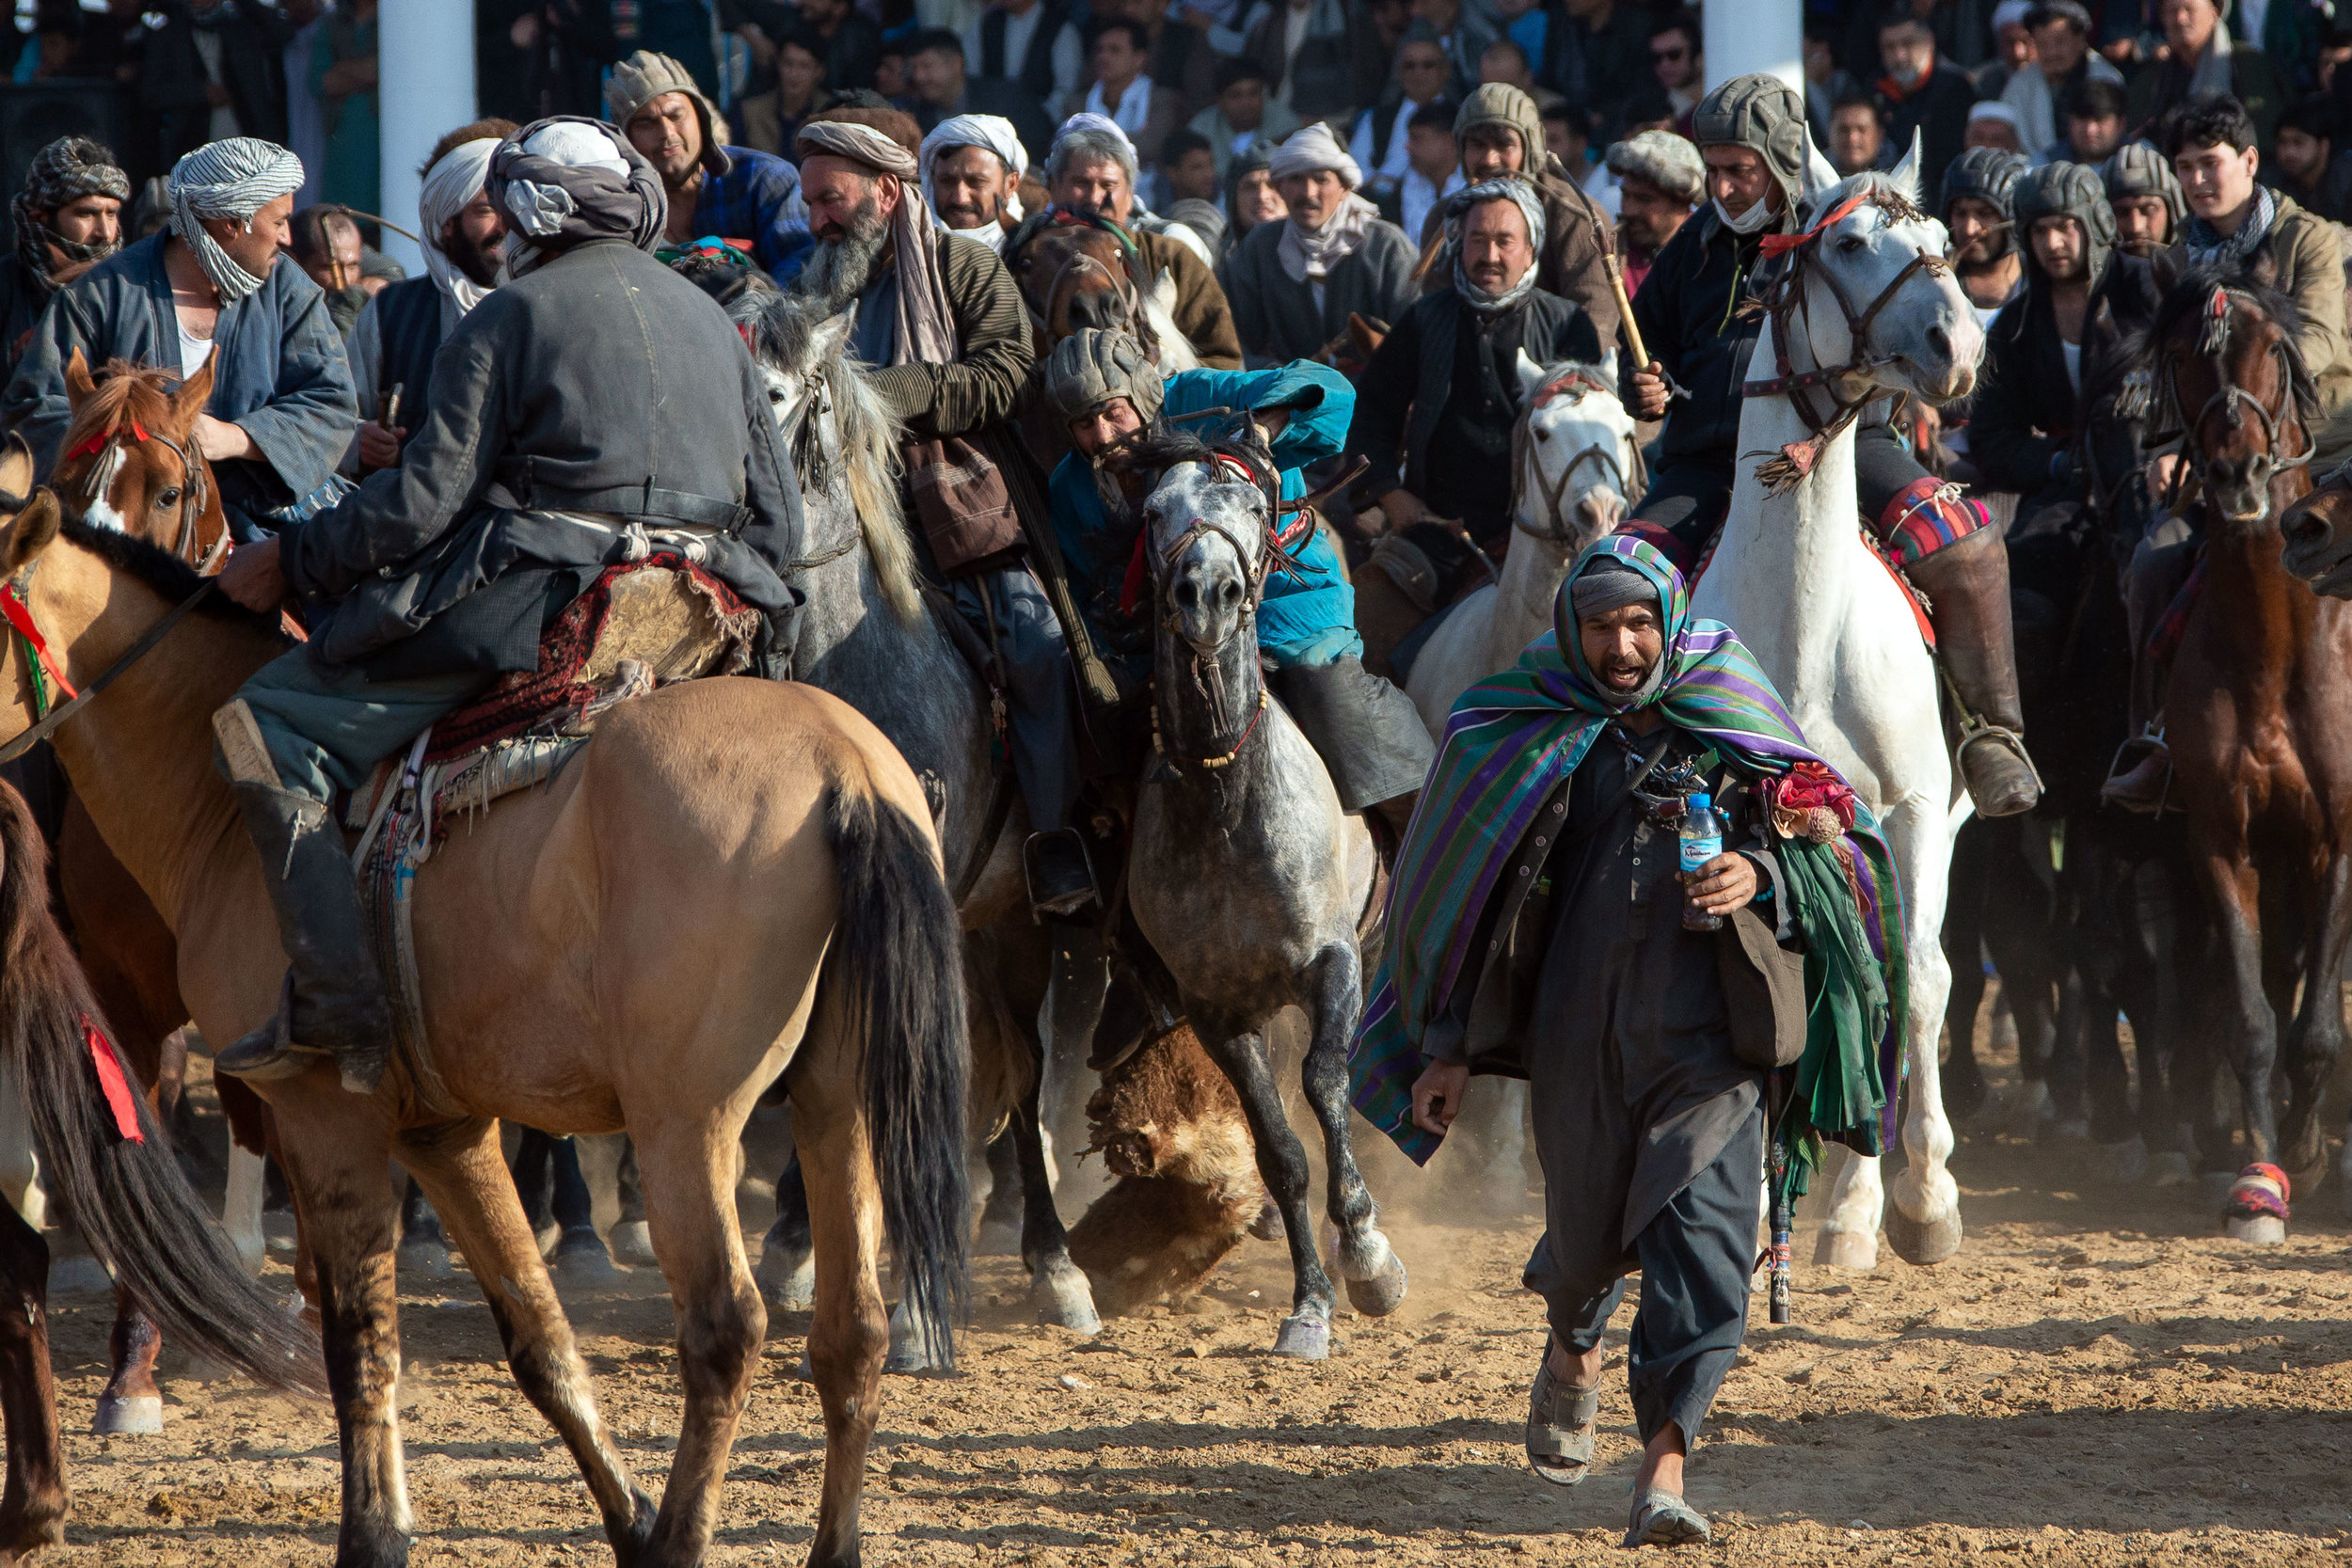 buzkashi-game-mazar-i-sharif-afghanistan.jpg